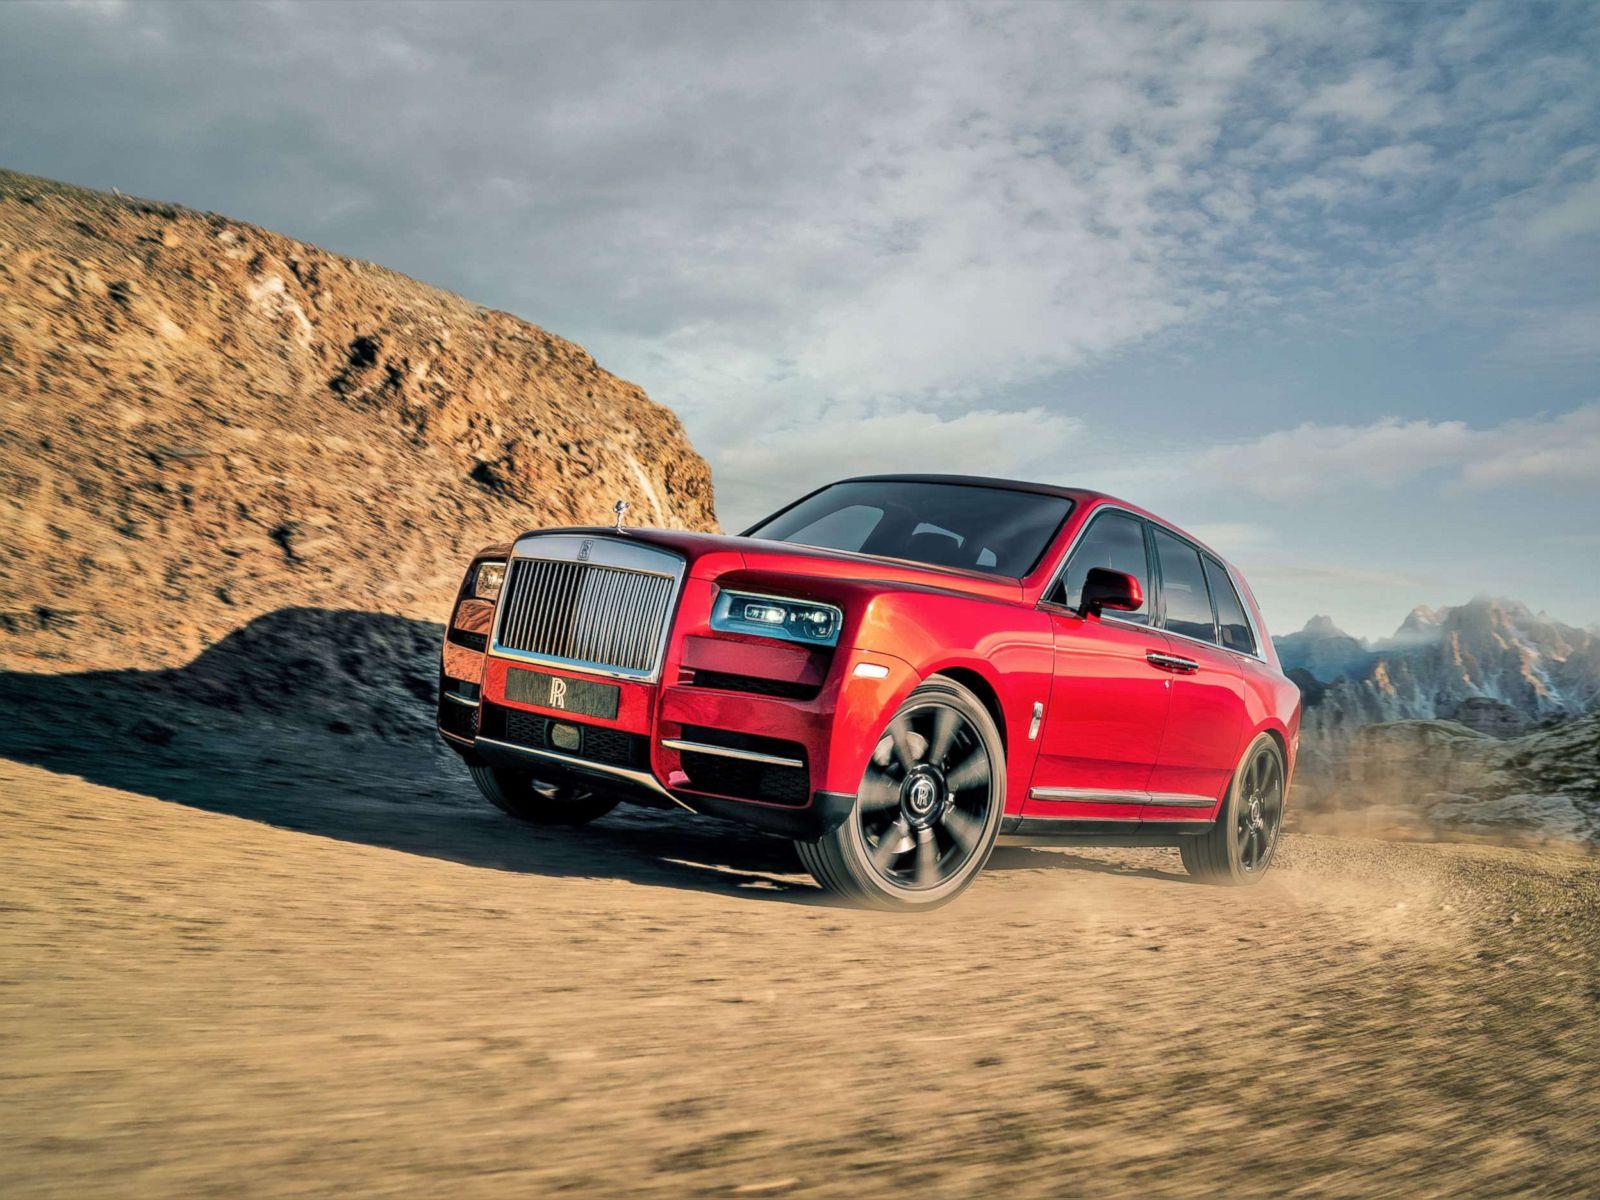 2019 Rolls Royce Cullinan: Design, Powertrain, Release >> The Rolls Royce Cullinan Meet The World S Most Expensive